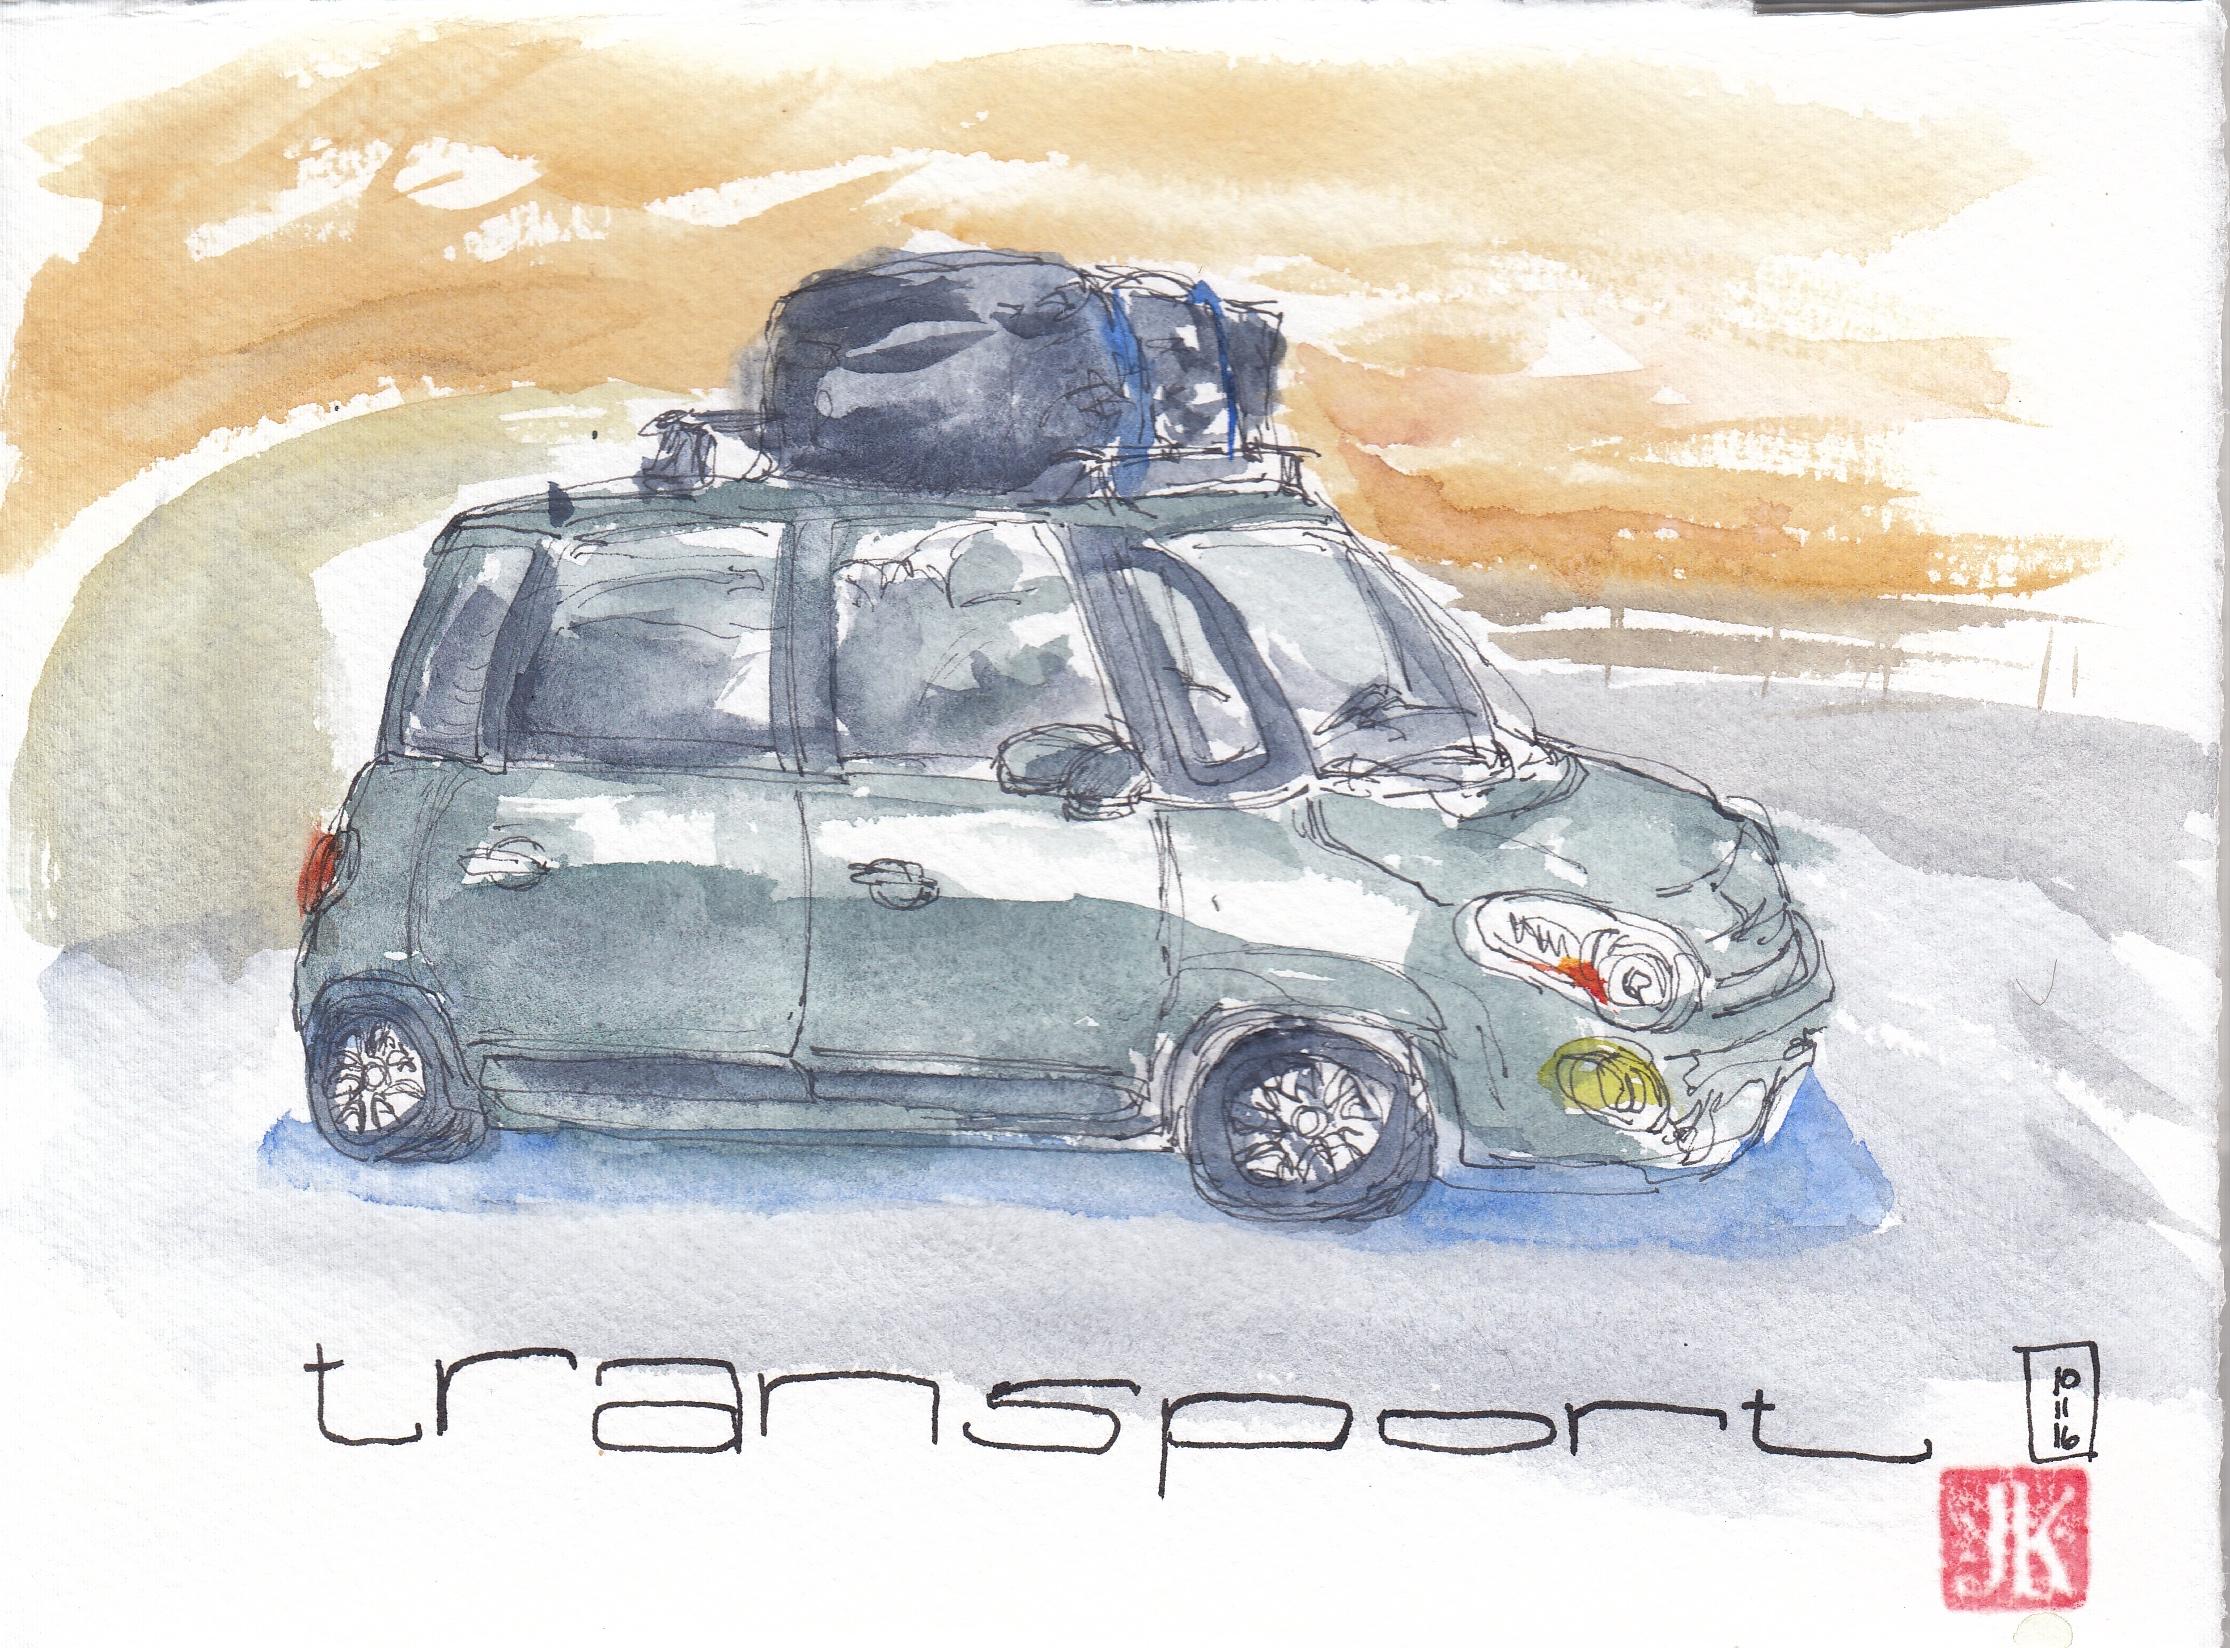 Day 11 - Transport